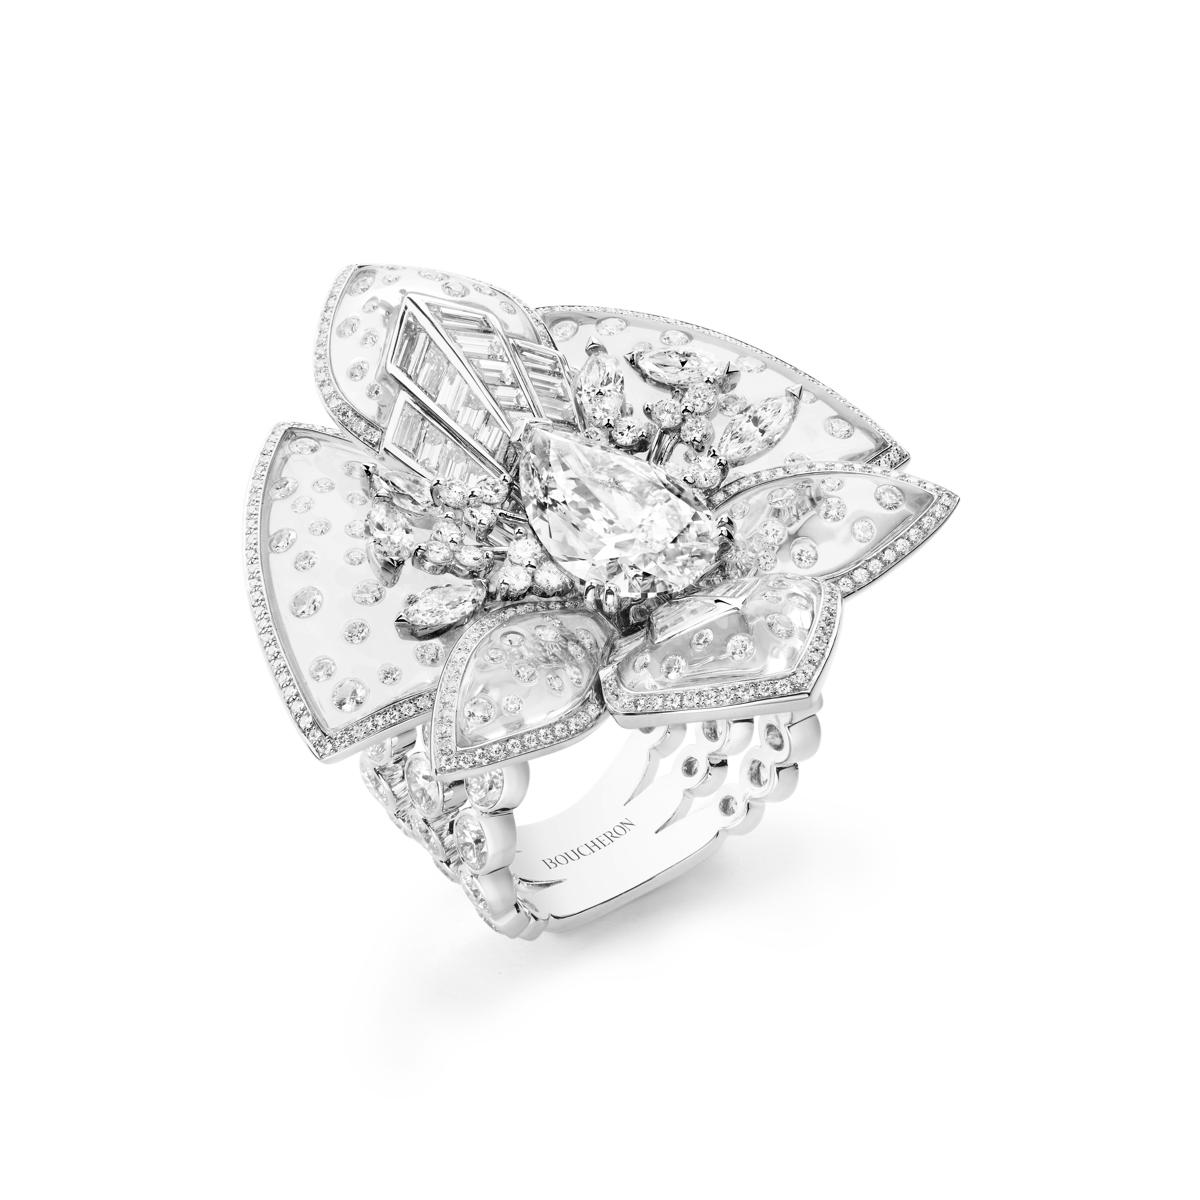 Lys radiant ring